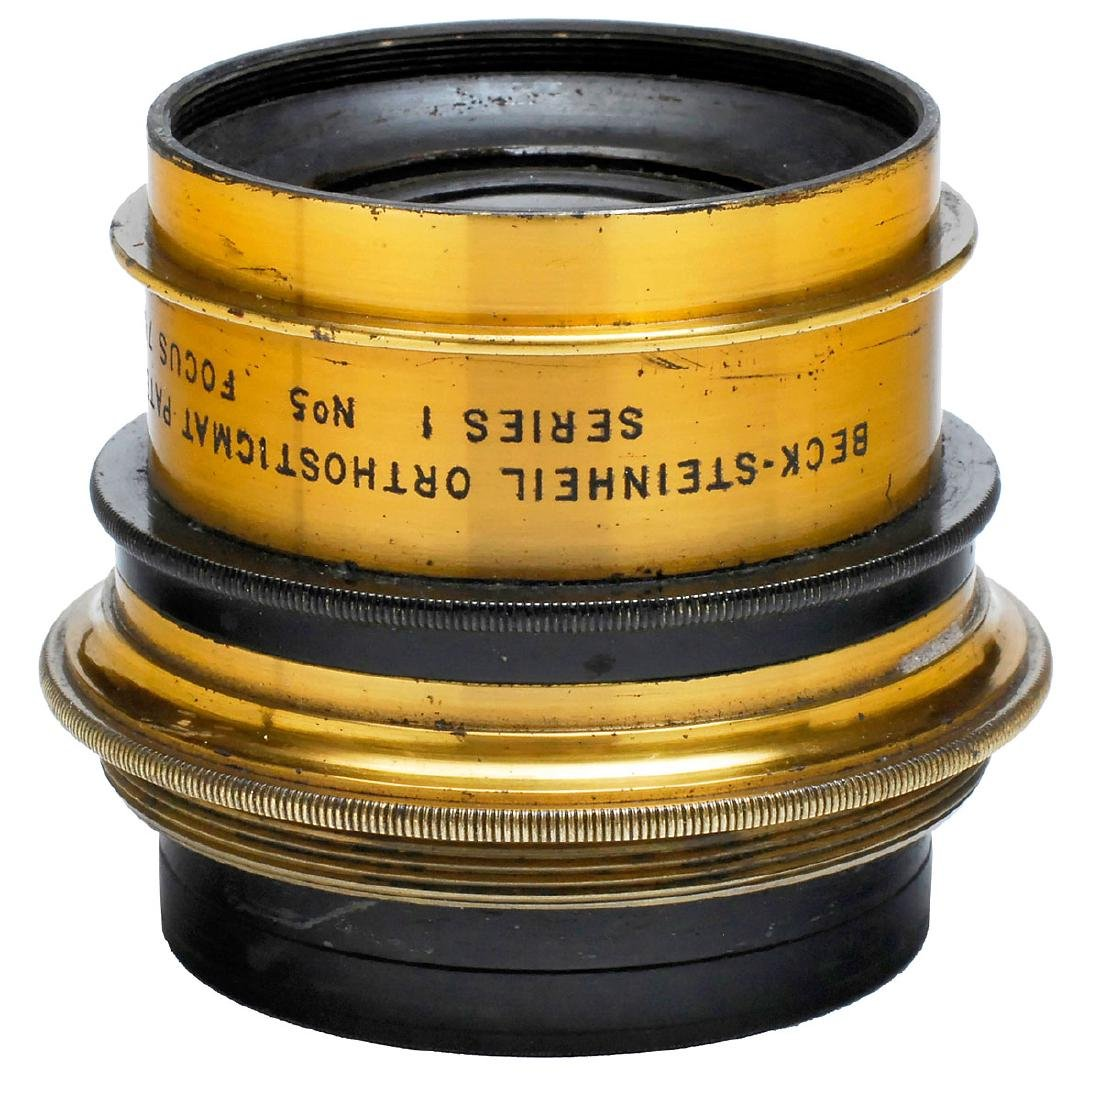 Beck Universal Telephoto Lens, c. 1898 - 2